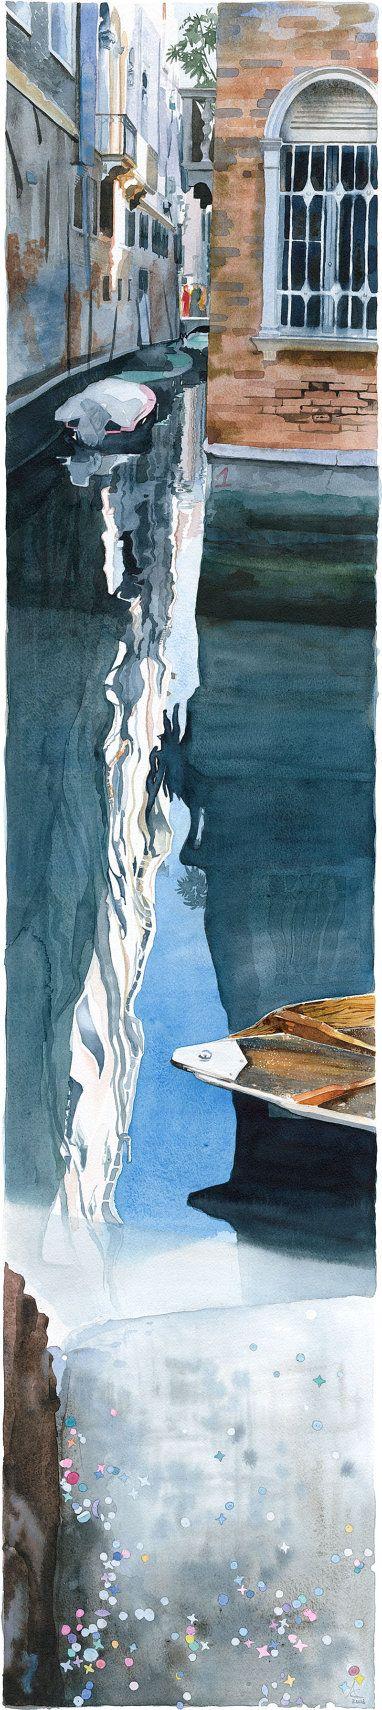 Watercolour Giclée print reflection on water by AnneliesClarke, £60.00